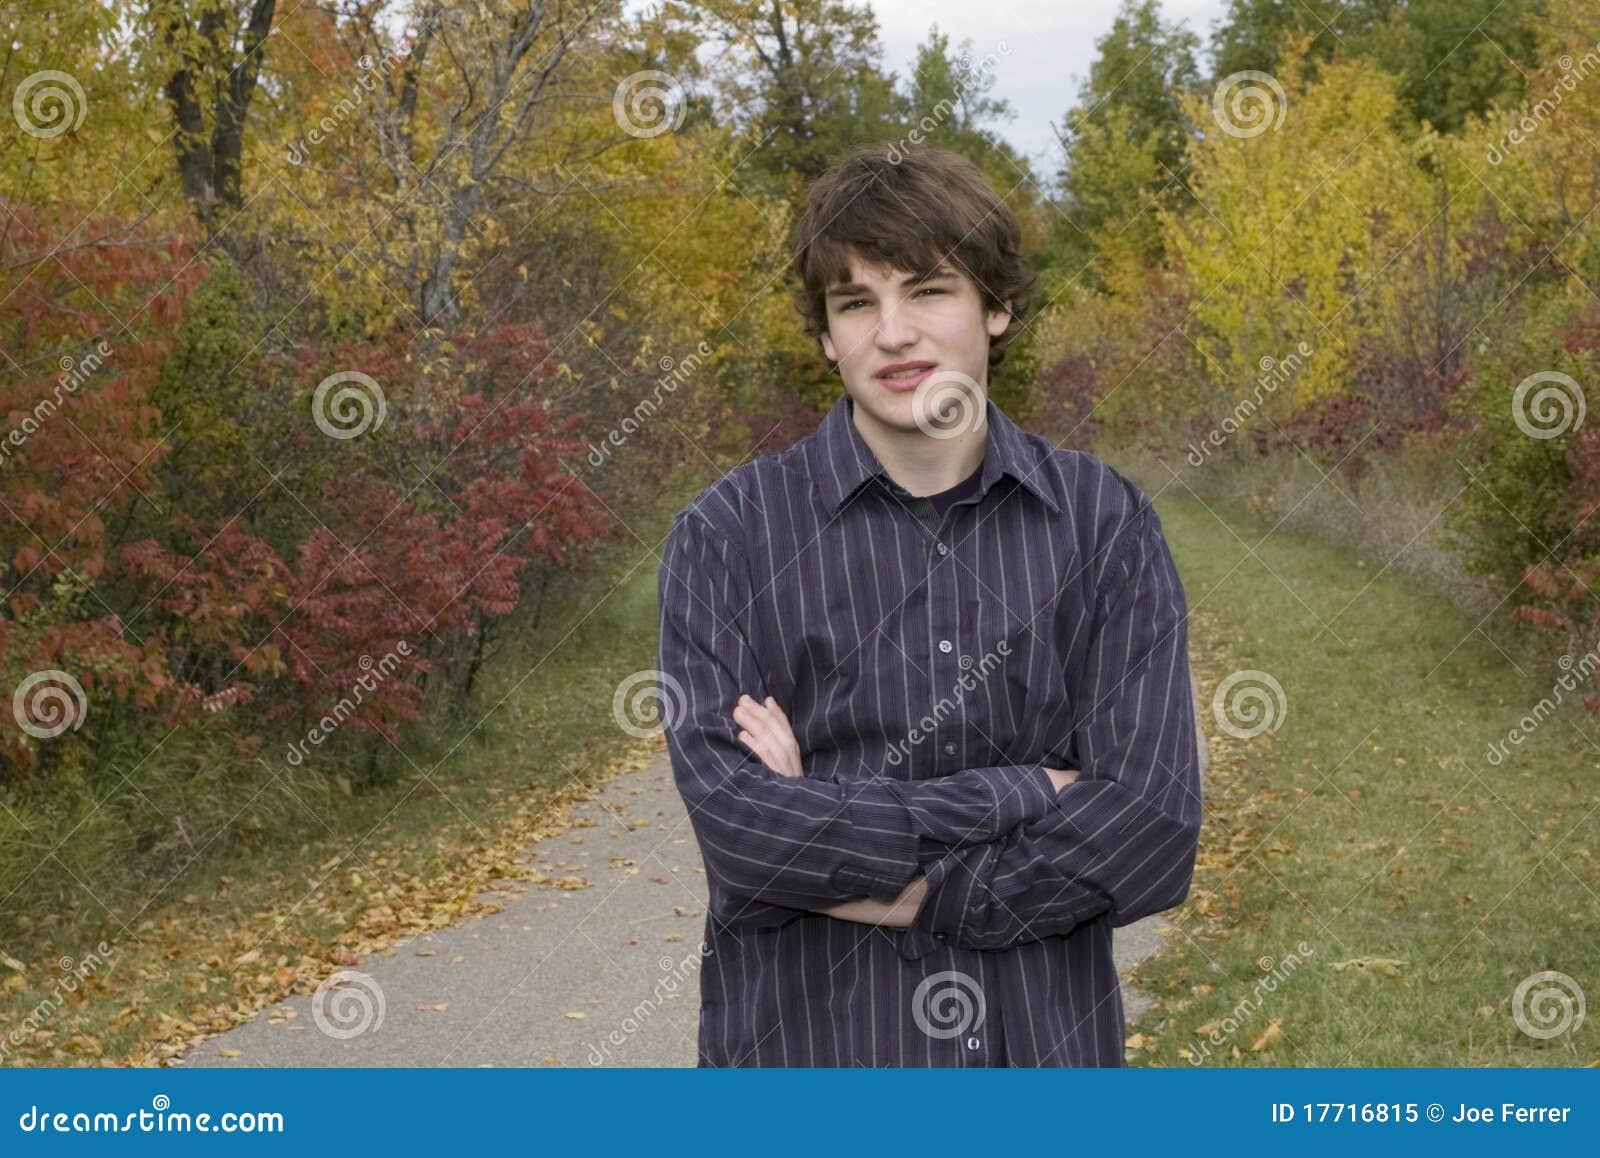 Casual Teen Portrait in Park